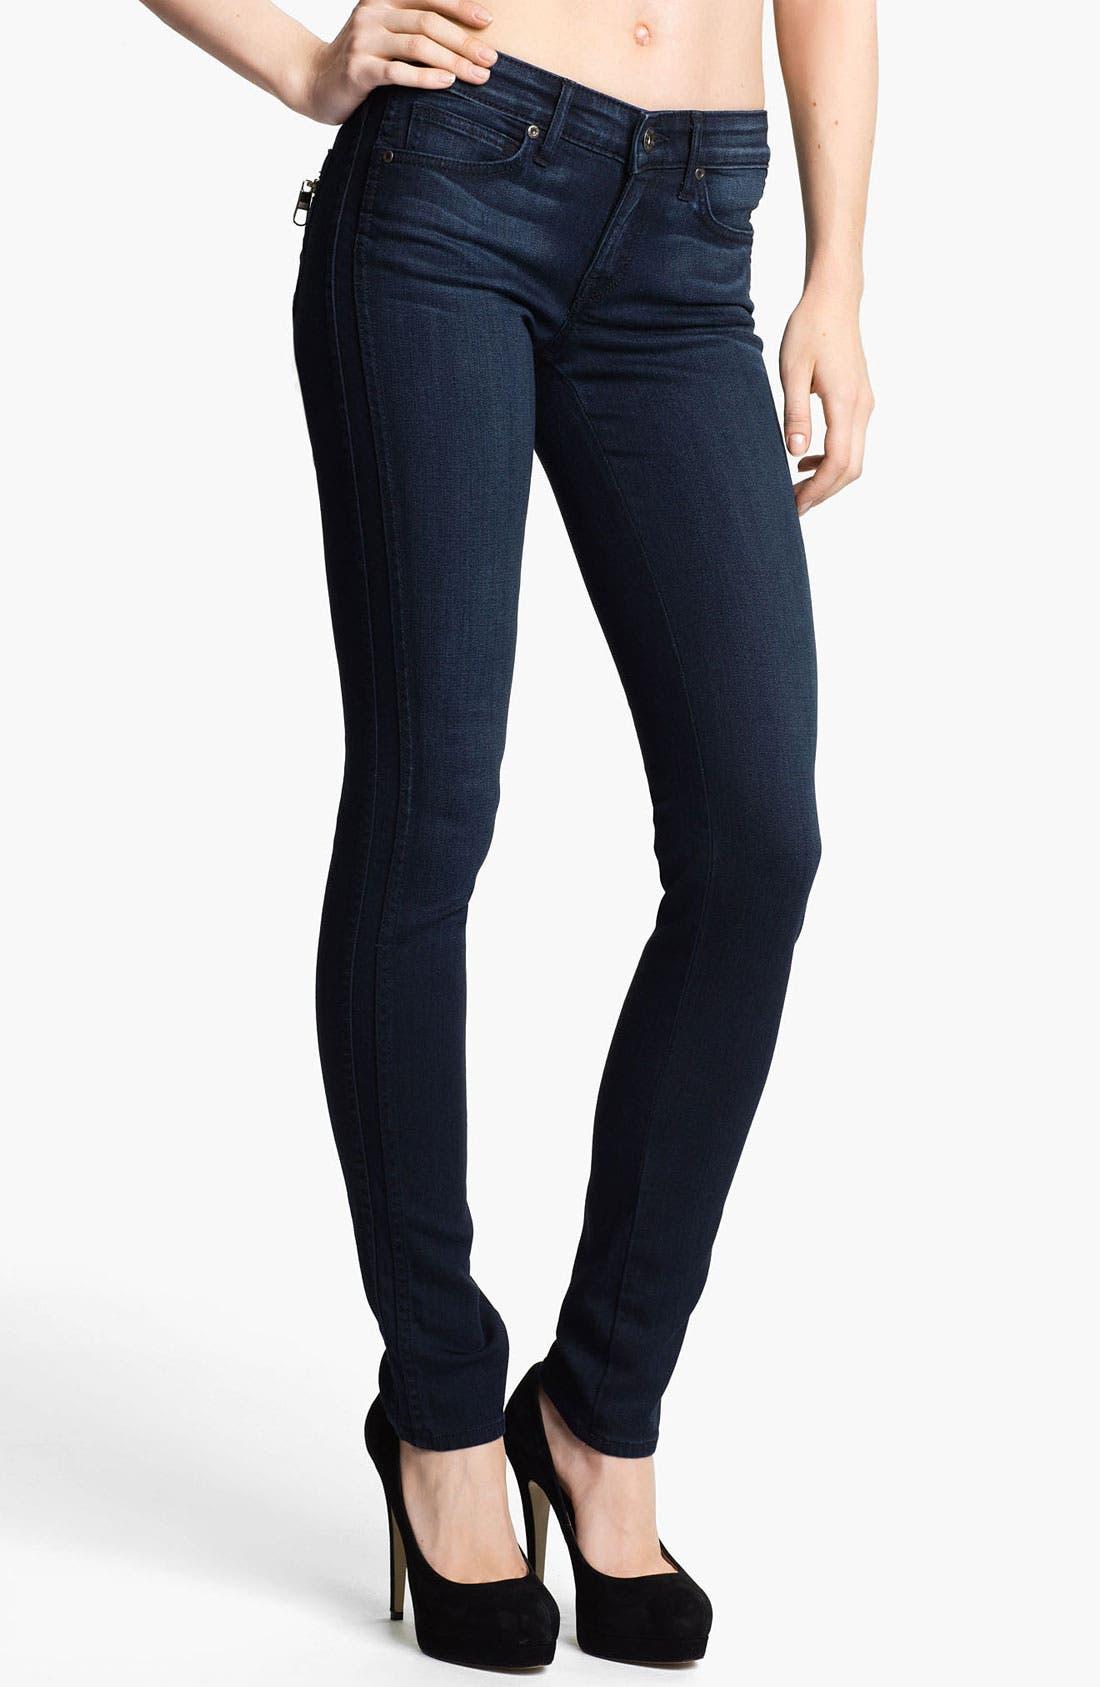 Main Image - Rich & Skinny 'Tuxedo' Skinny Jeans (Zeus)